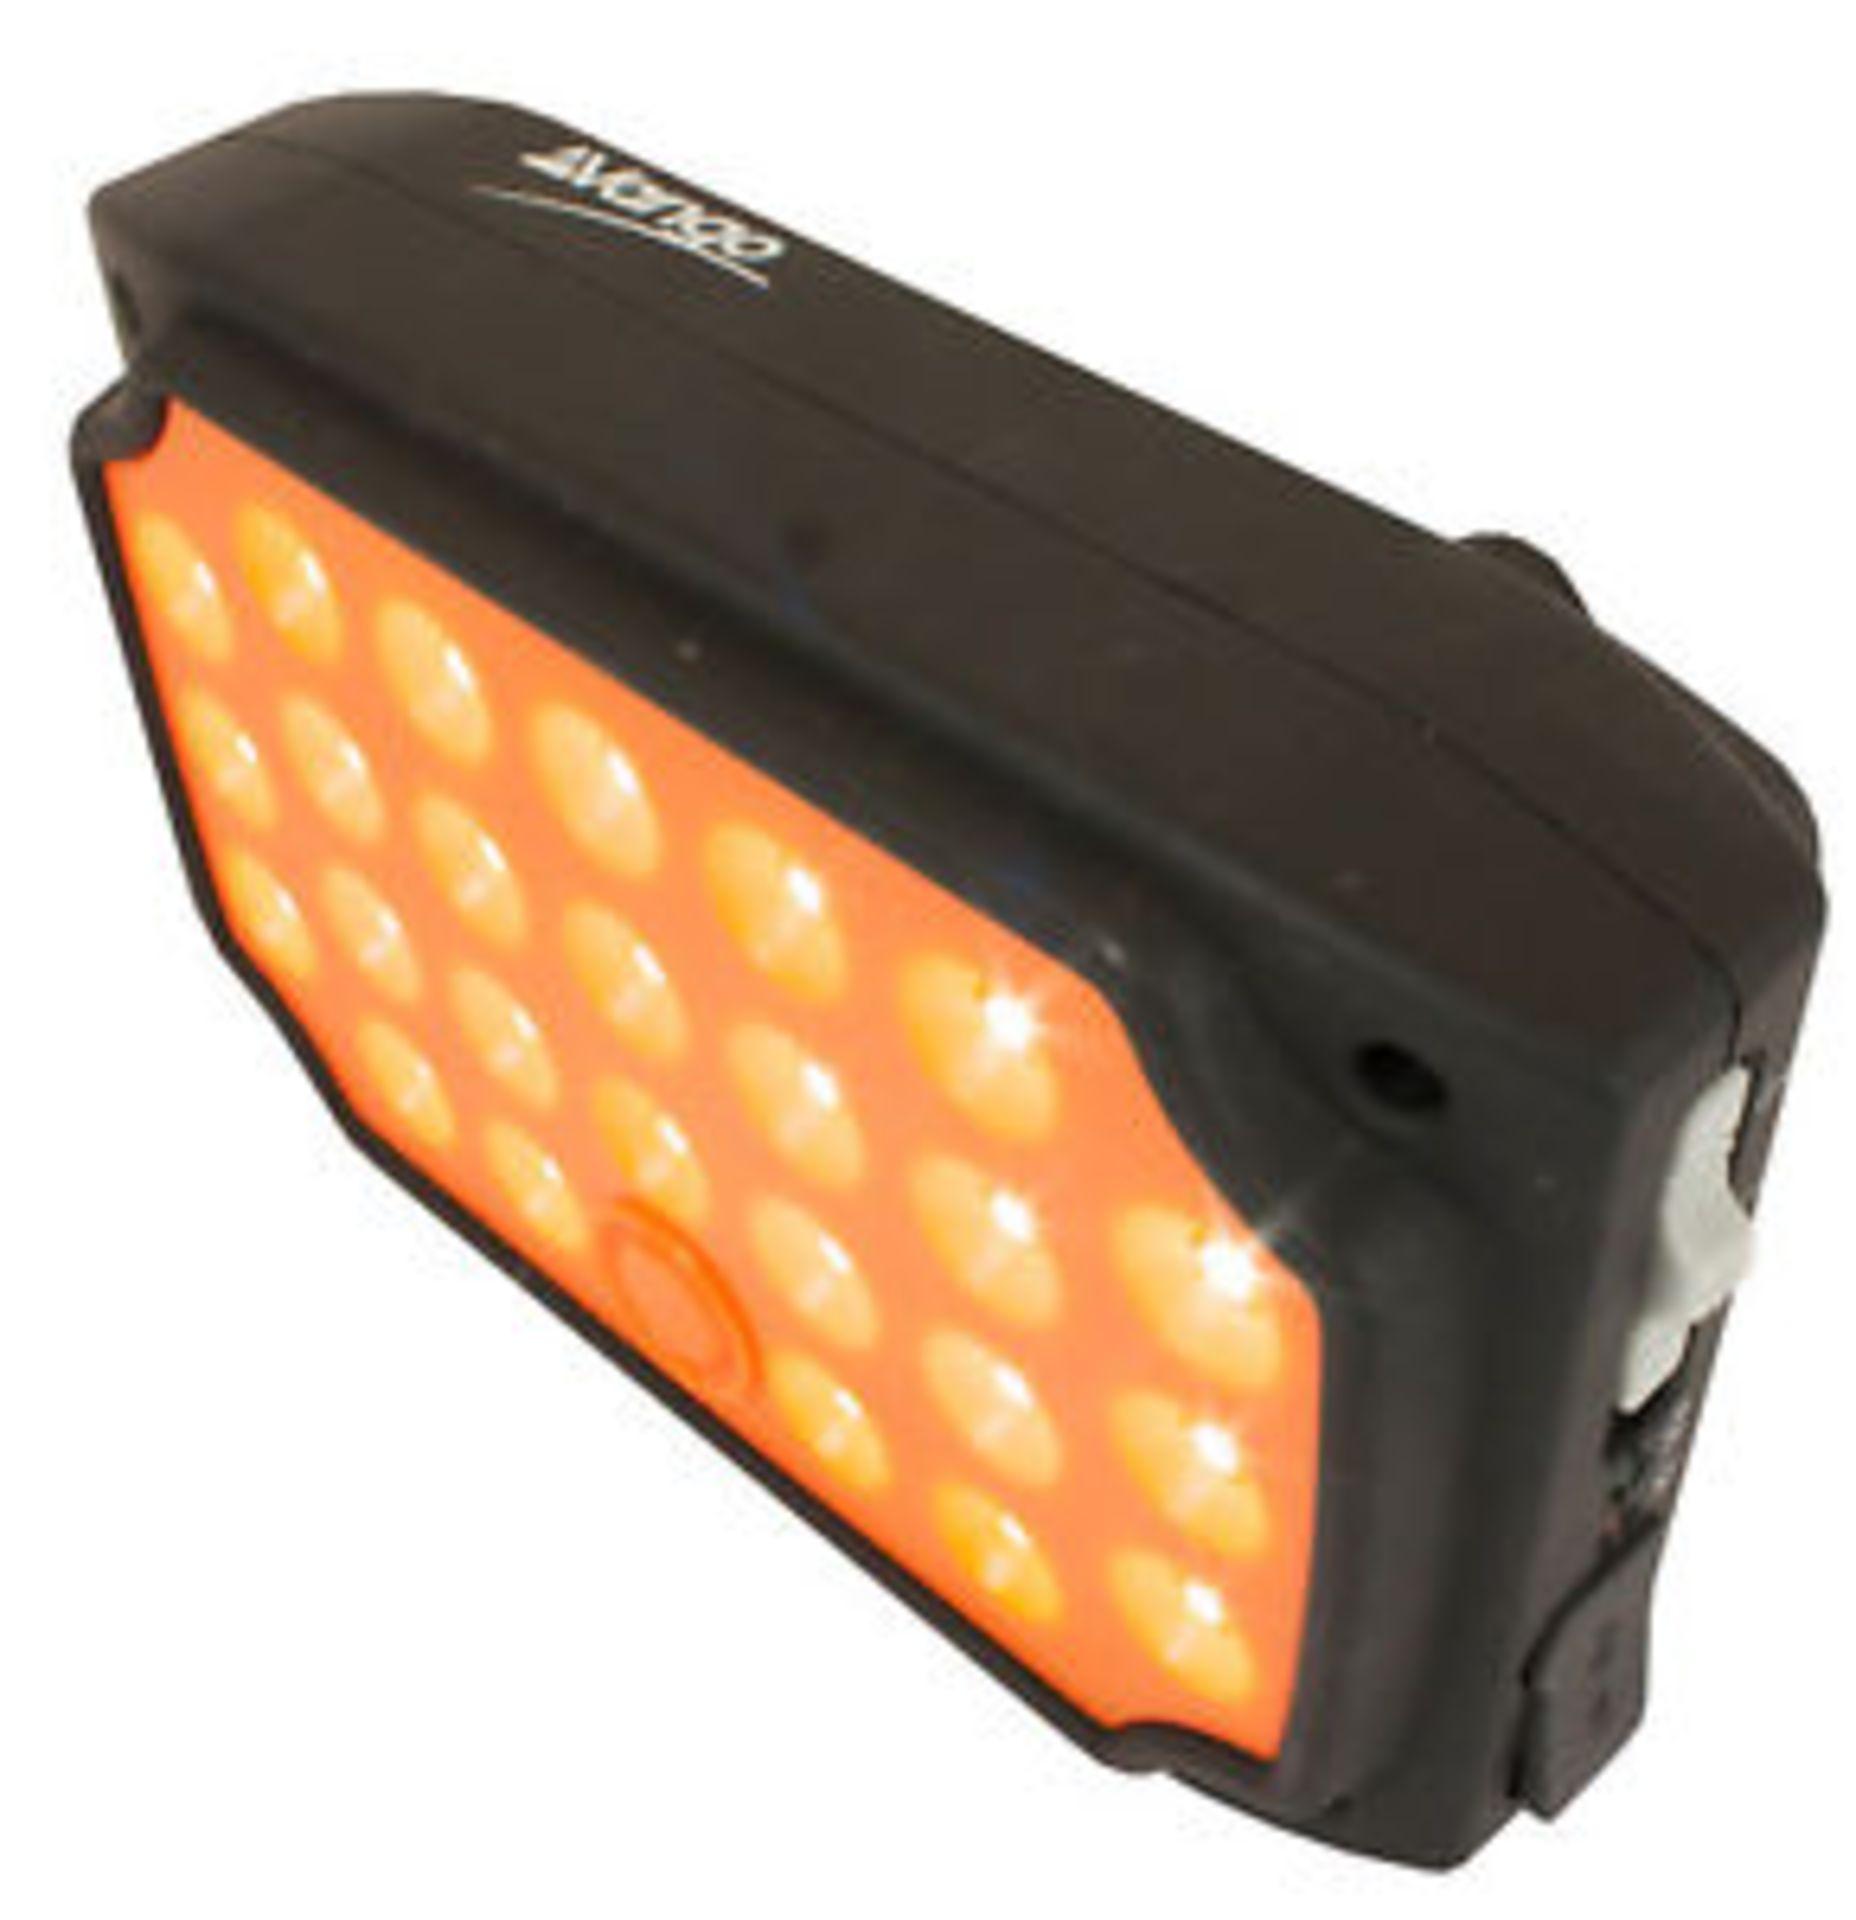 Lot 30322 - V Brand New Vango Light Pad Lantern - RRP £30.00 - DC Charger Plugs Into Cigarette Lighter -